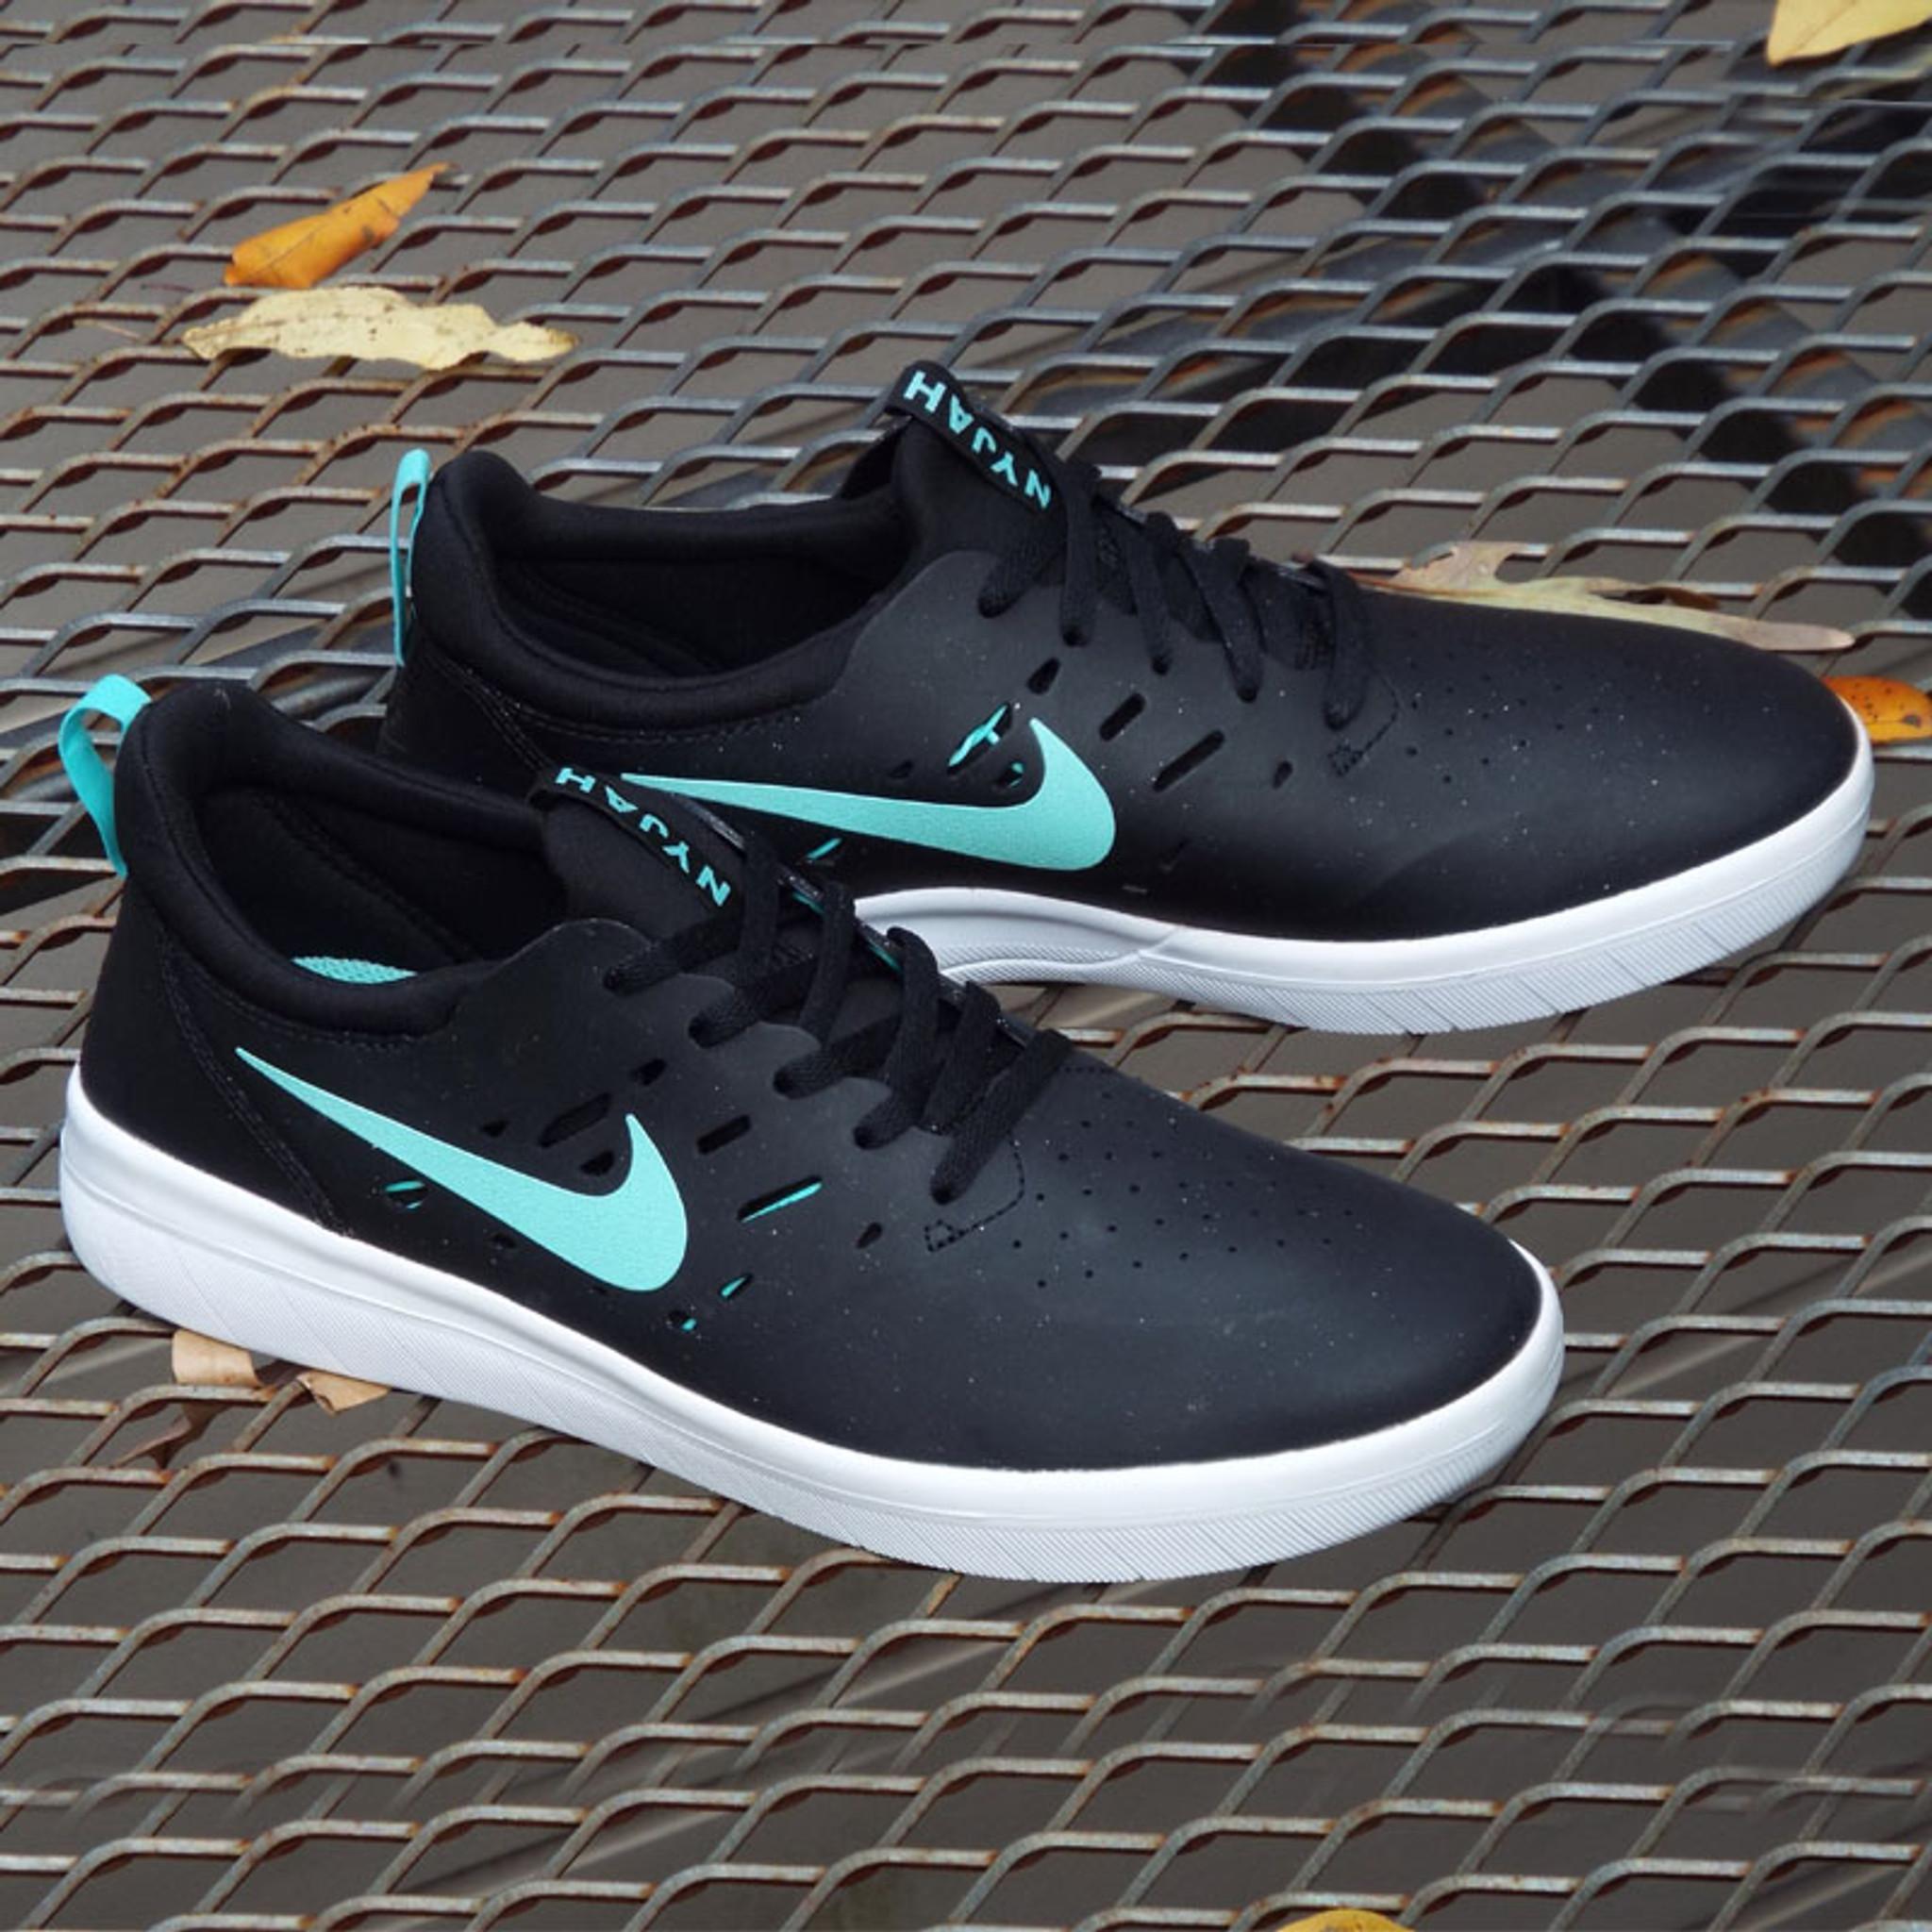 Nike SB Nyjah Free Shoe - Black